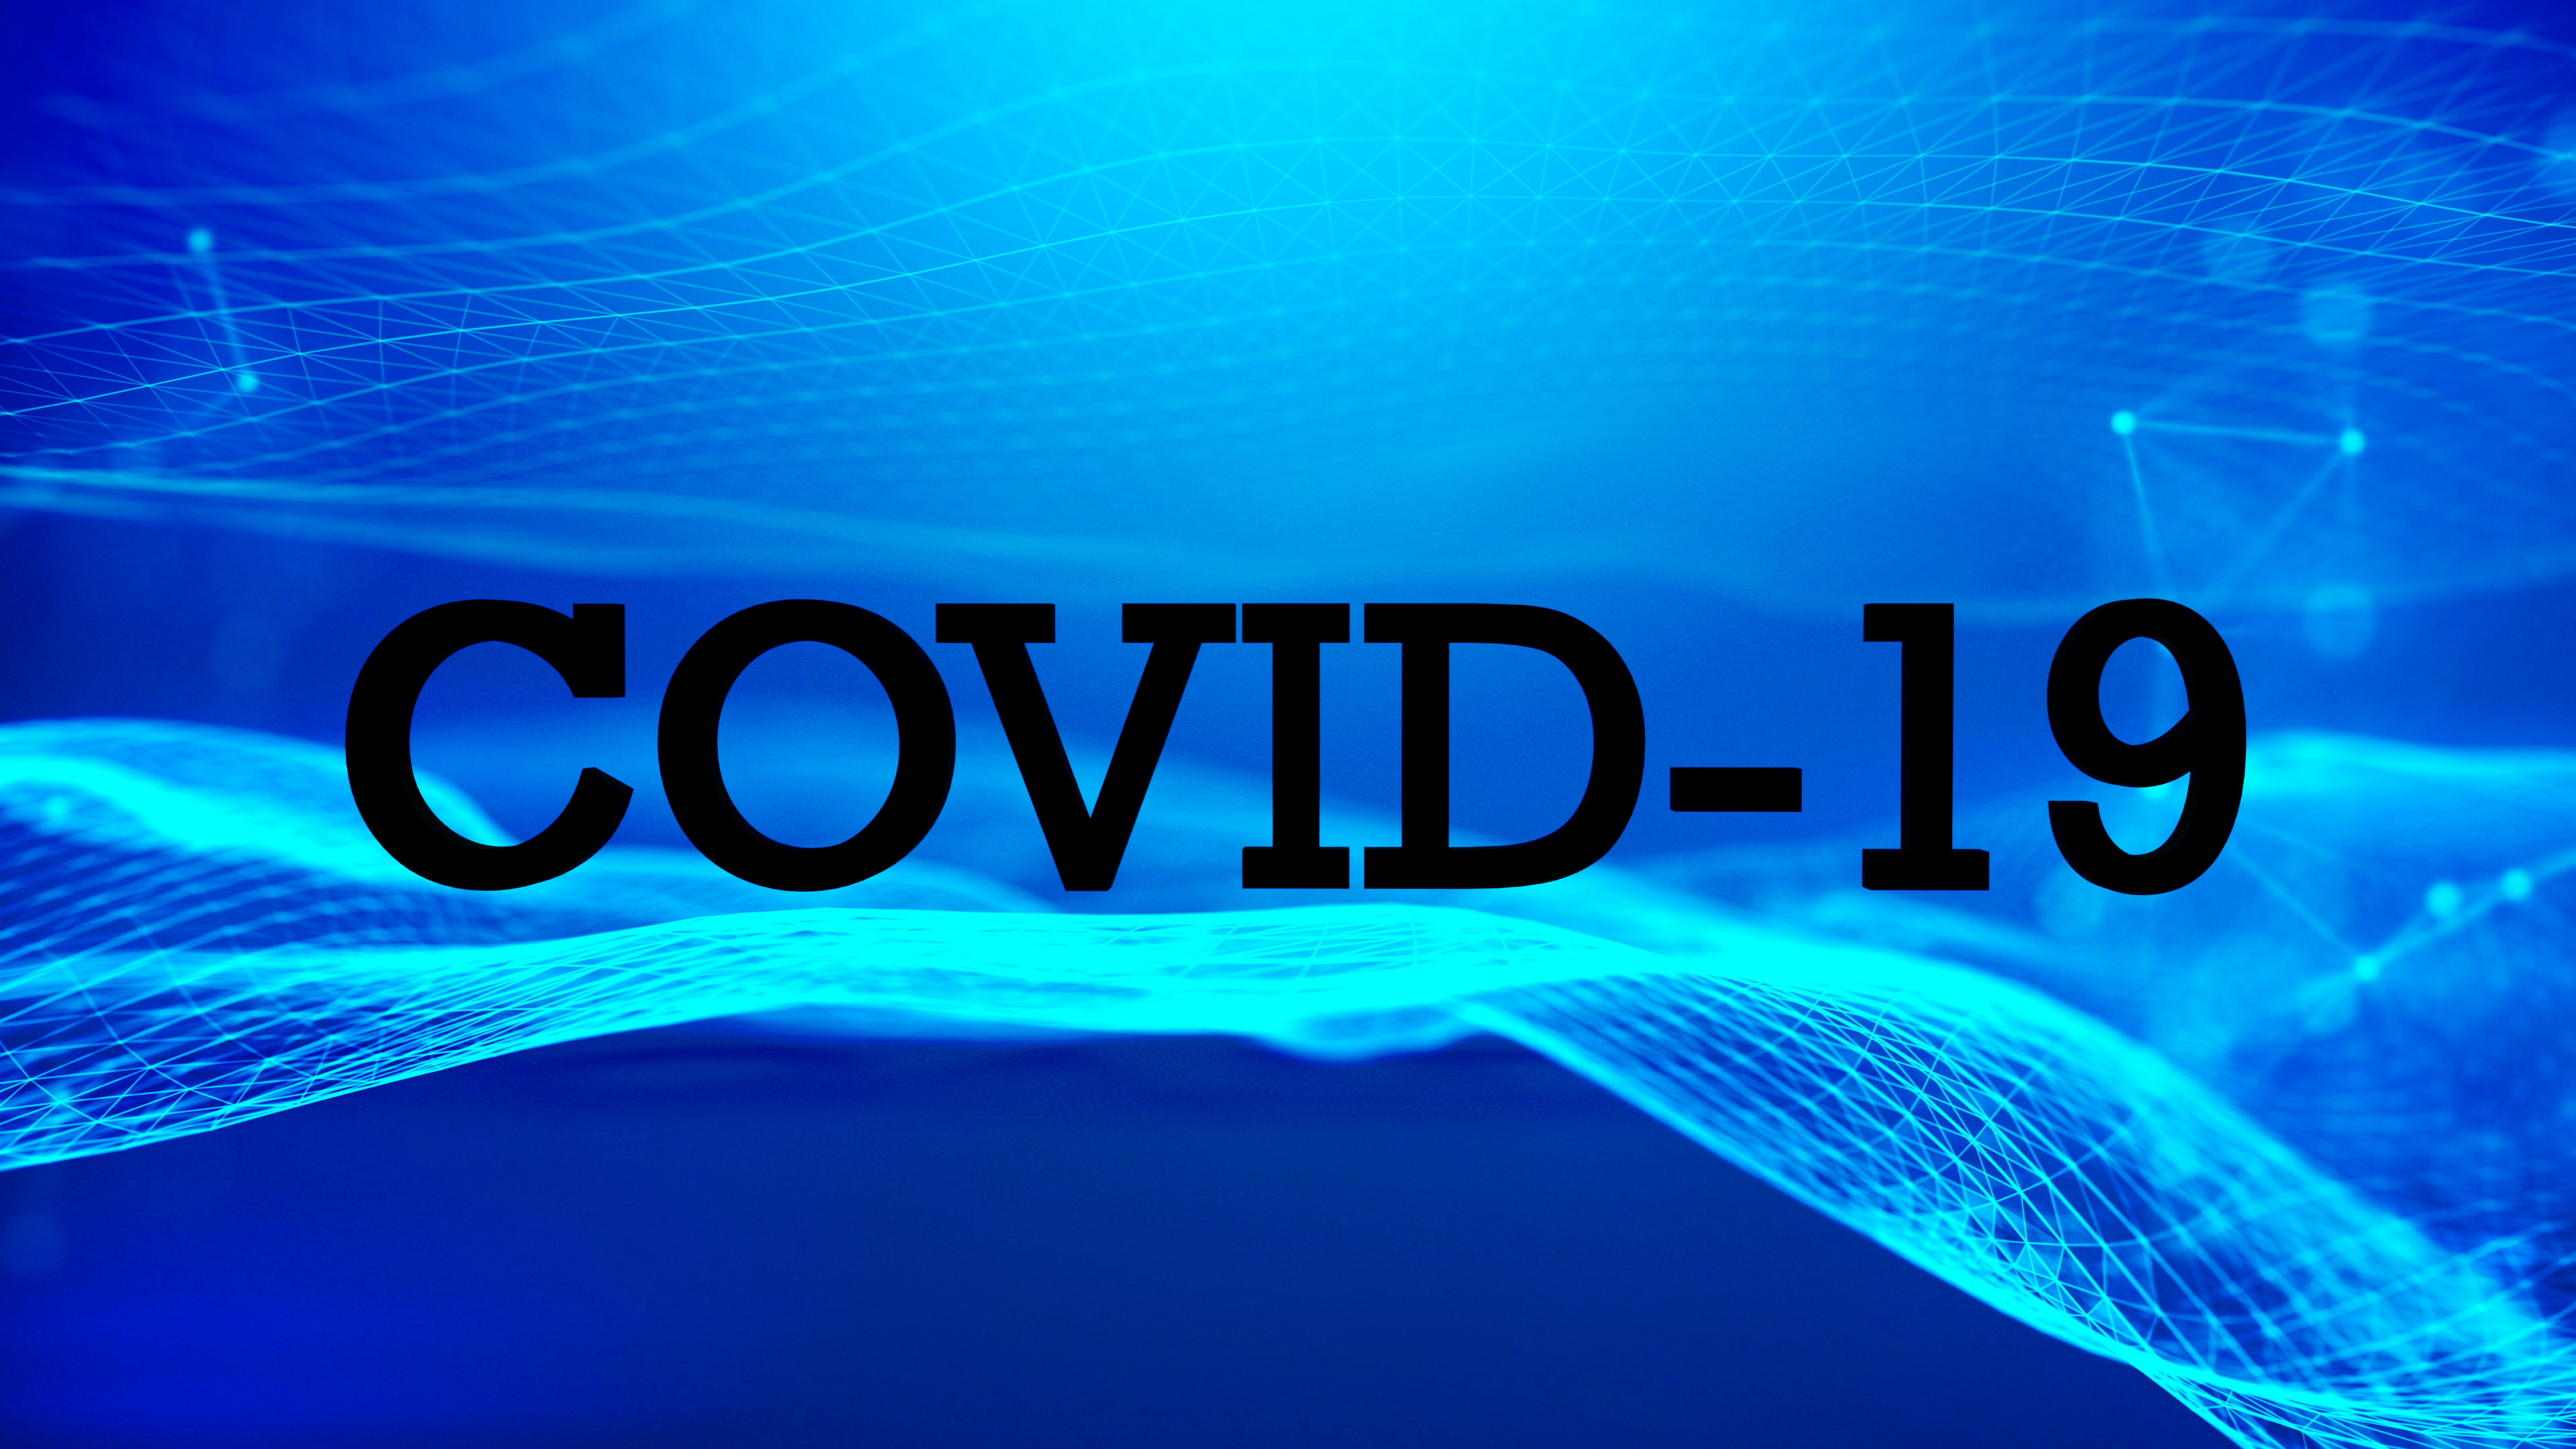 Epiphany Healthcare's COVID-19 Novel Coronavirus Response Plan